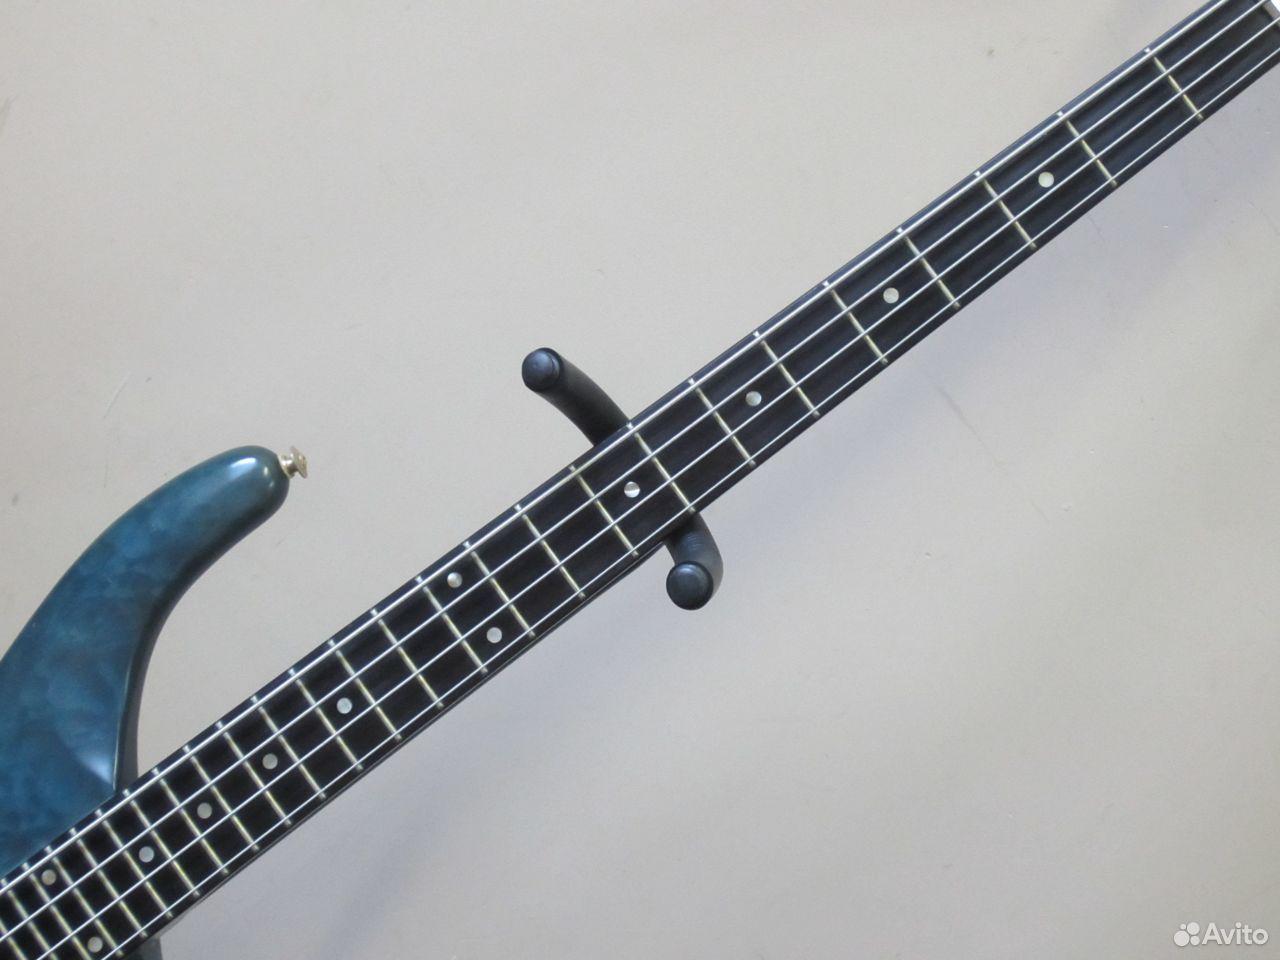 Бас-гитара Greco PXB-1000 (1990 Japan)  89025069832 купить 3